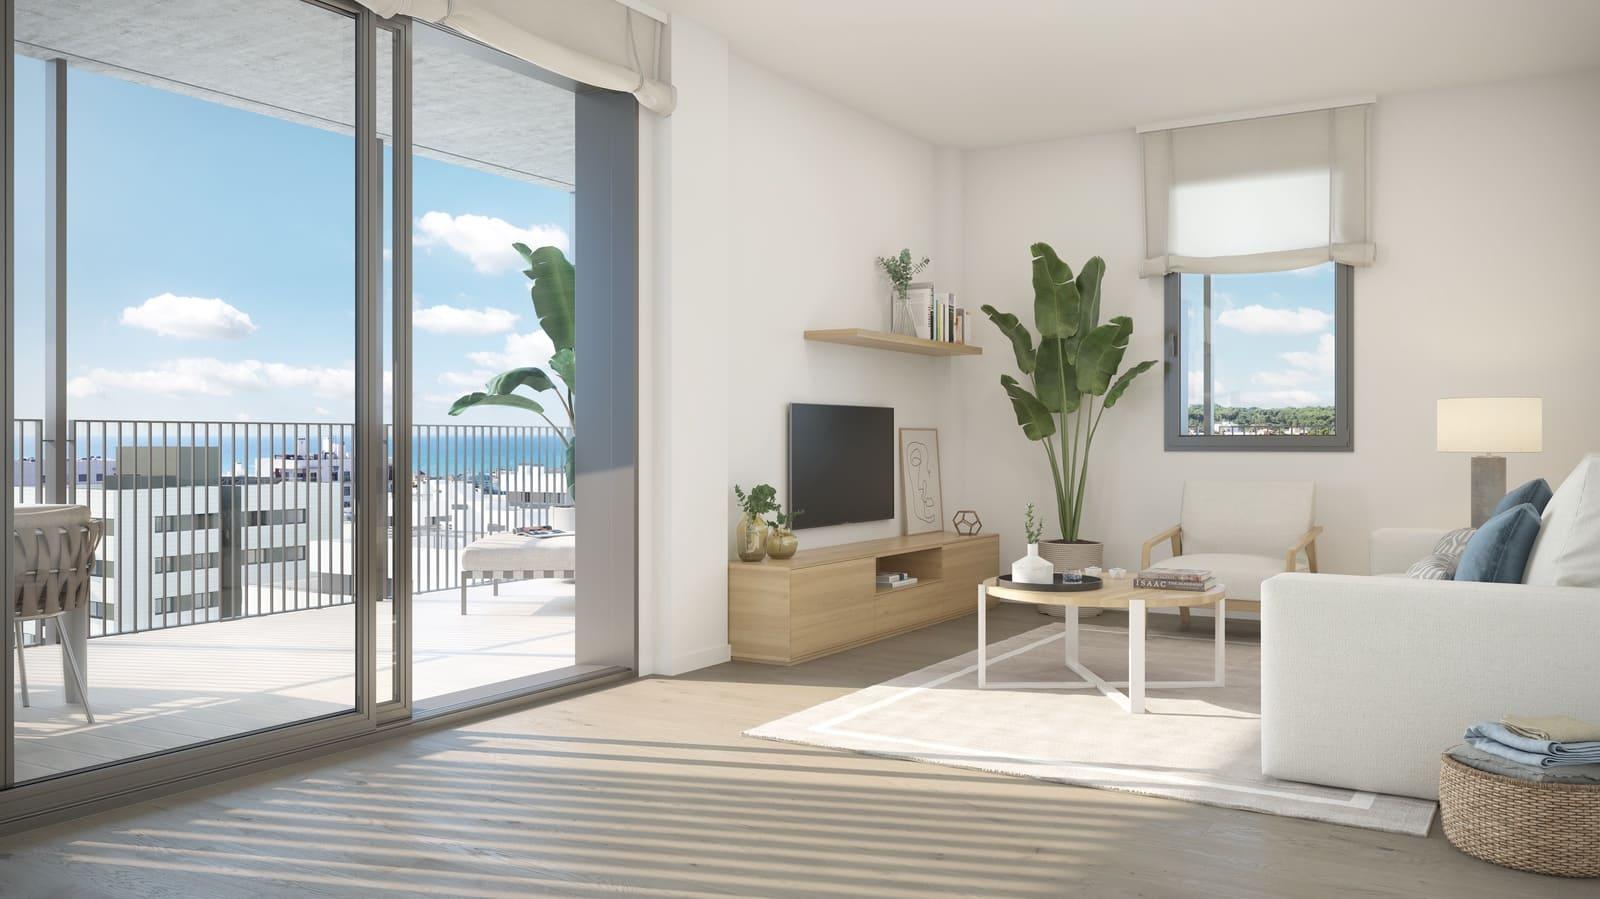 4 bedroom Apartment for sale in Vilanova i la Geltru with ...